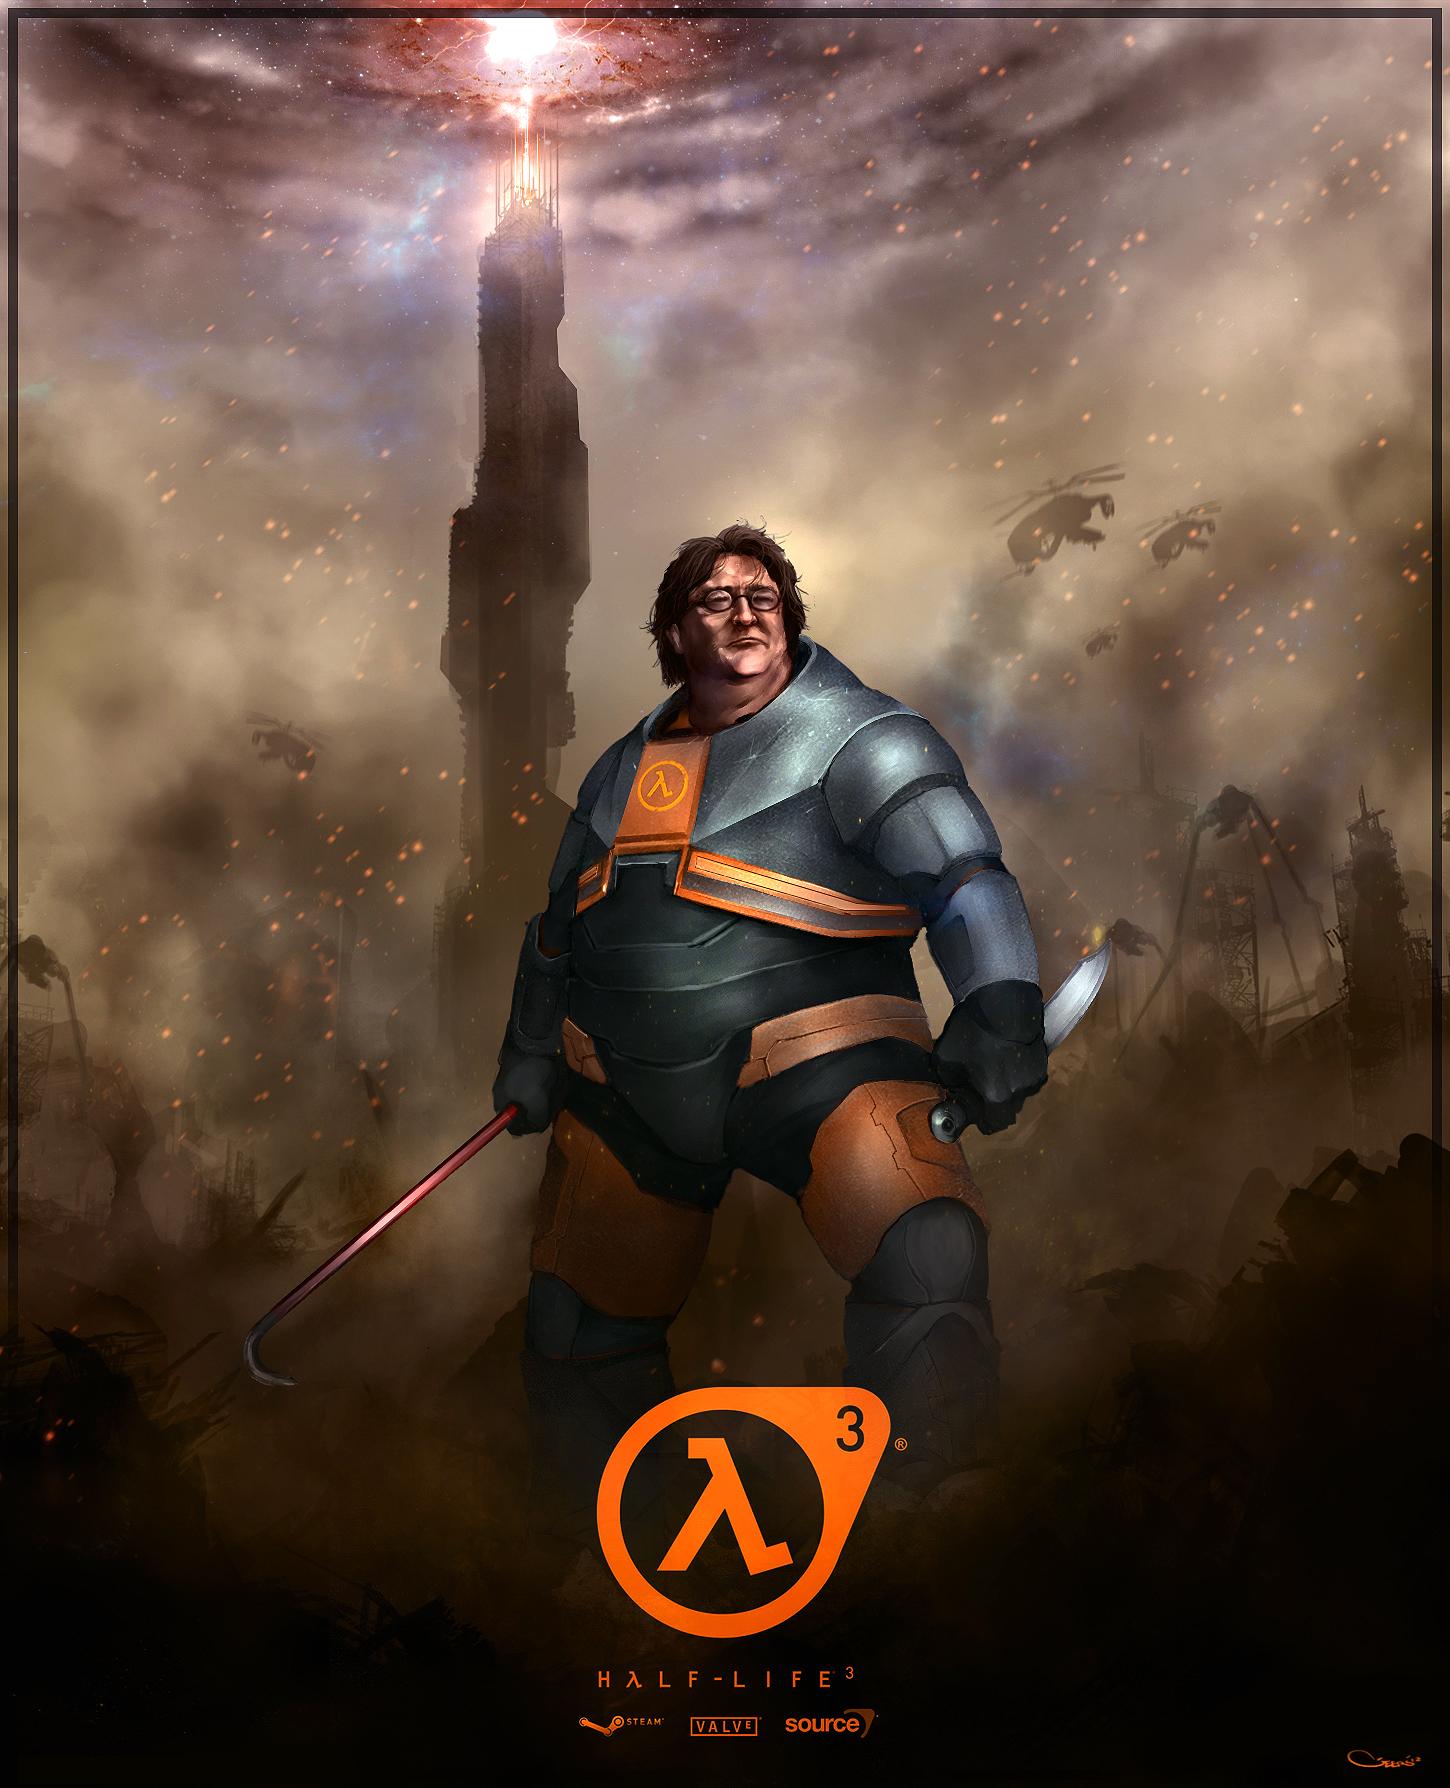 Gabe Newell Half Life 3 By Darrengeers Half Life Gabes Fan Art